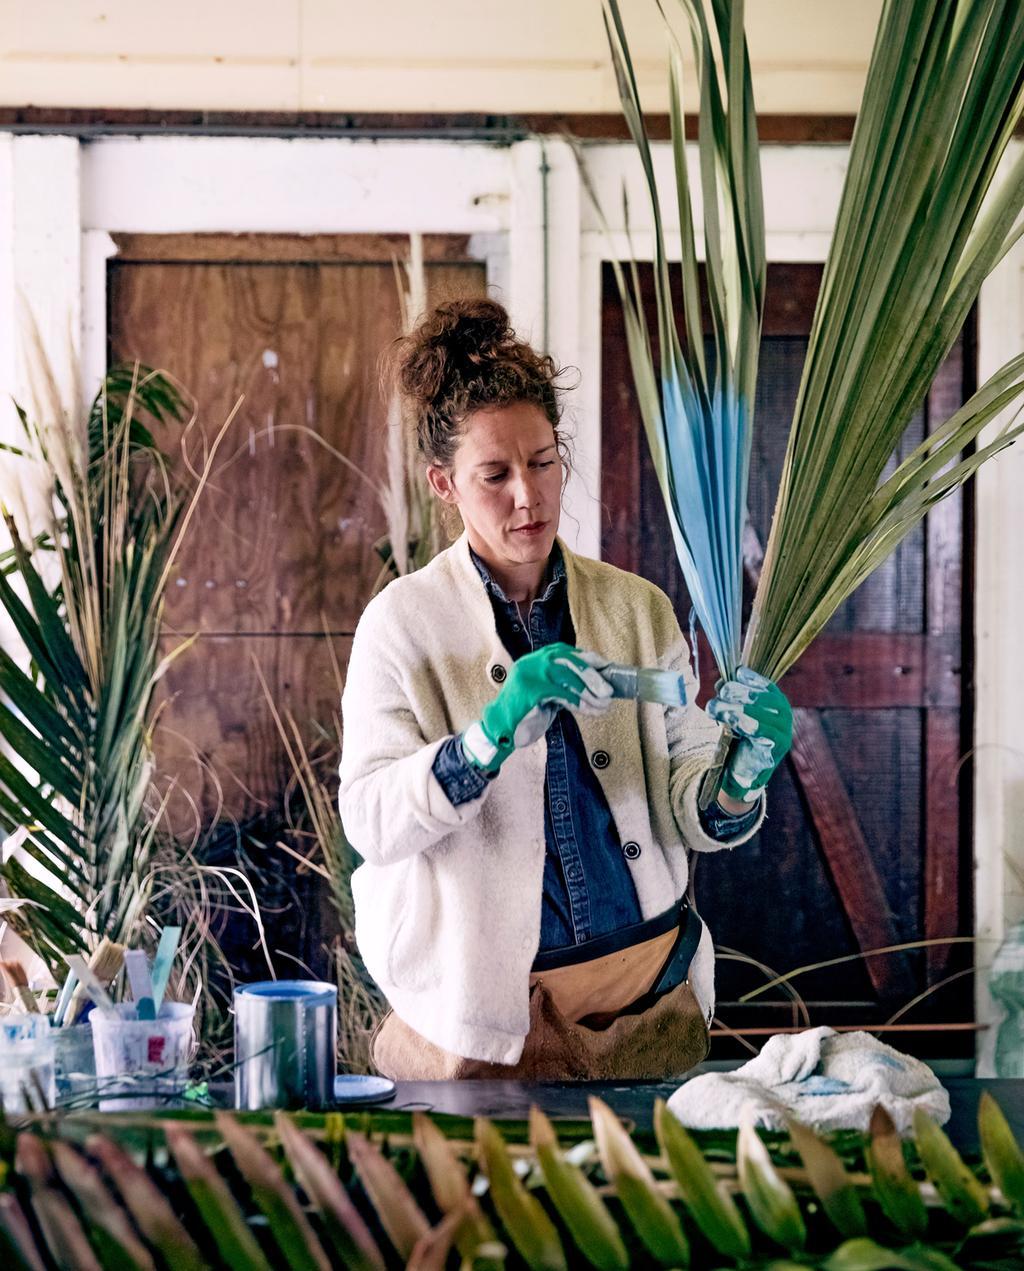 vtwonen 8-2019 | Ambacht Mariette & Denise zelfgekweekte biologische bloemen | takken verfen